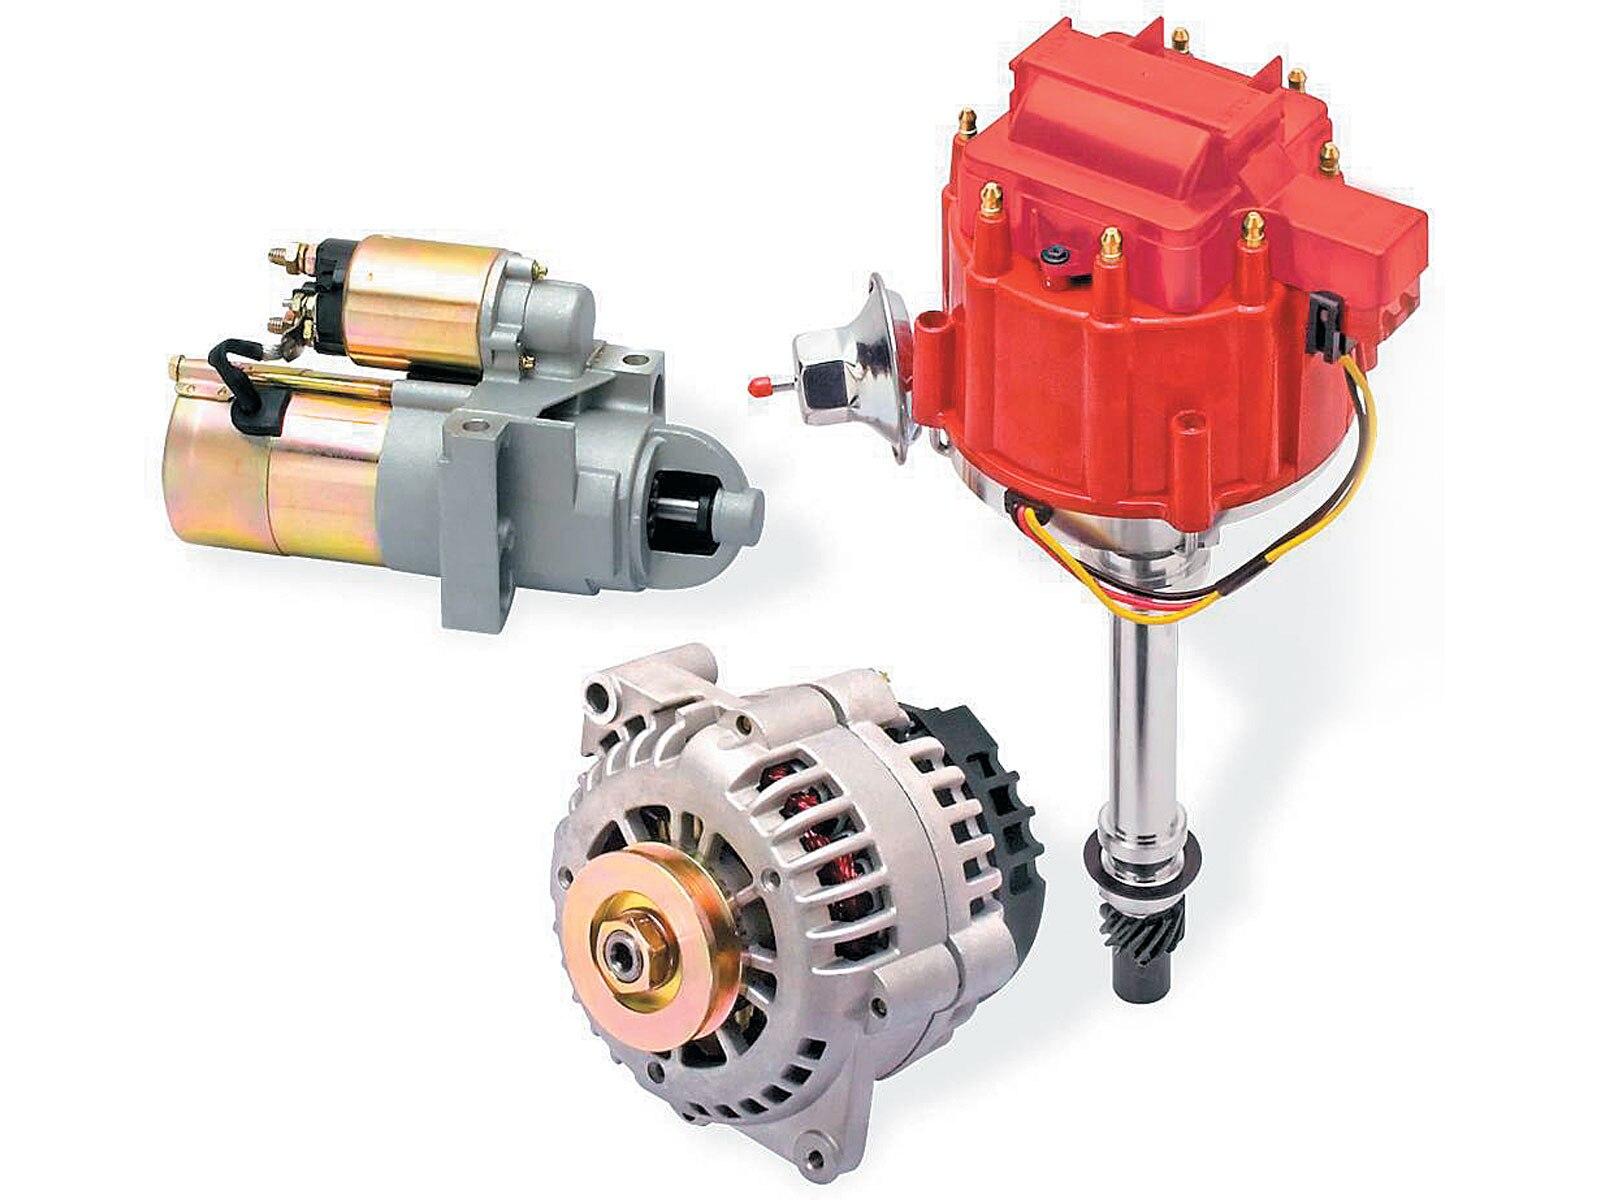 lrmp_0912_02-budget_friendly_performance_parts-eastwood_maxxpower_parts6